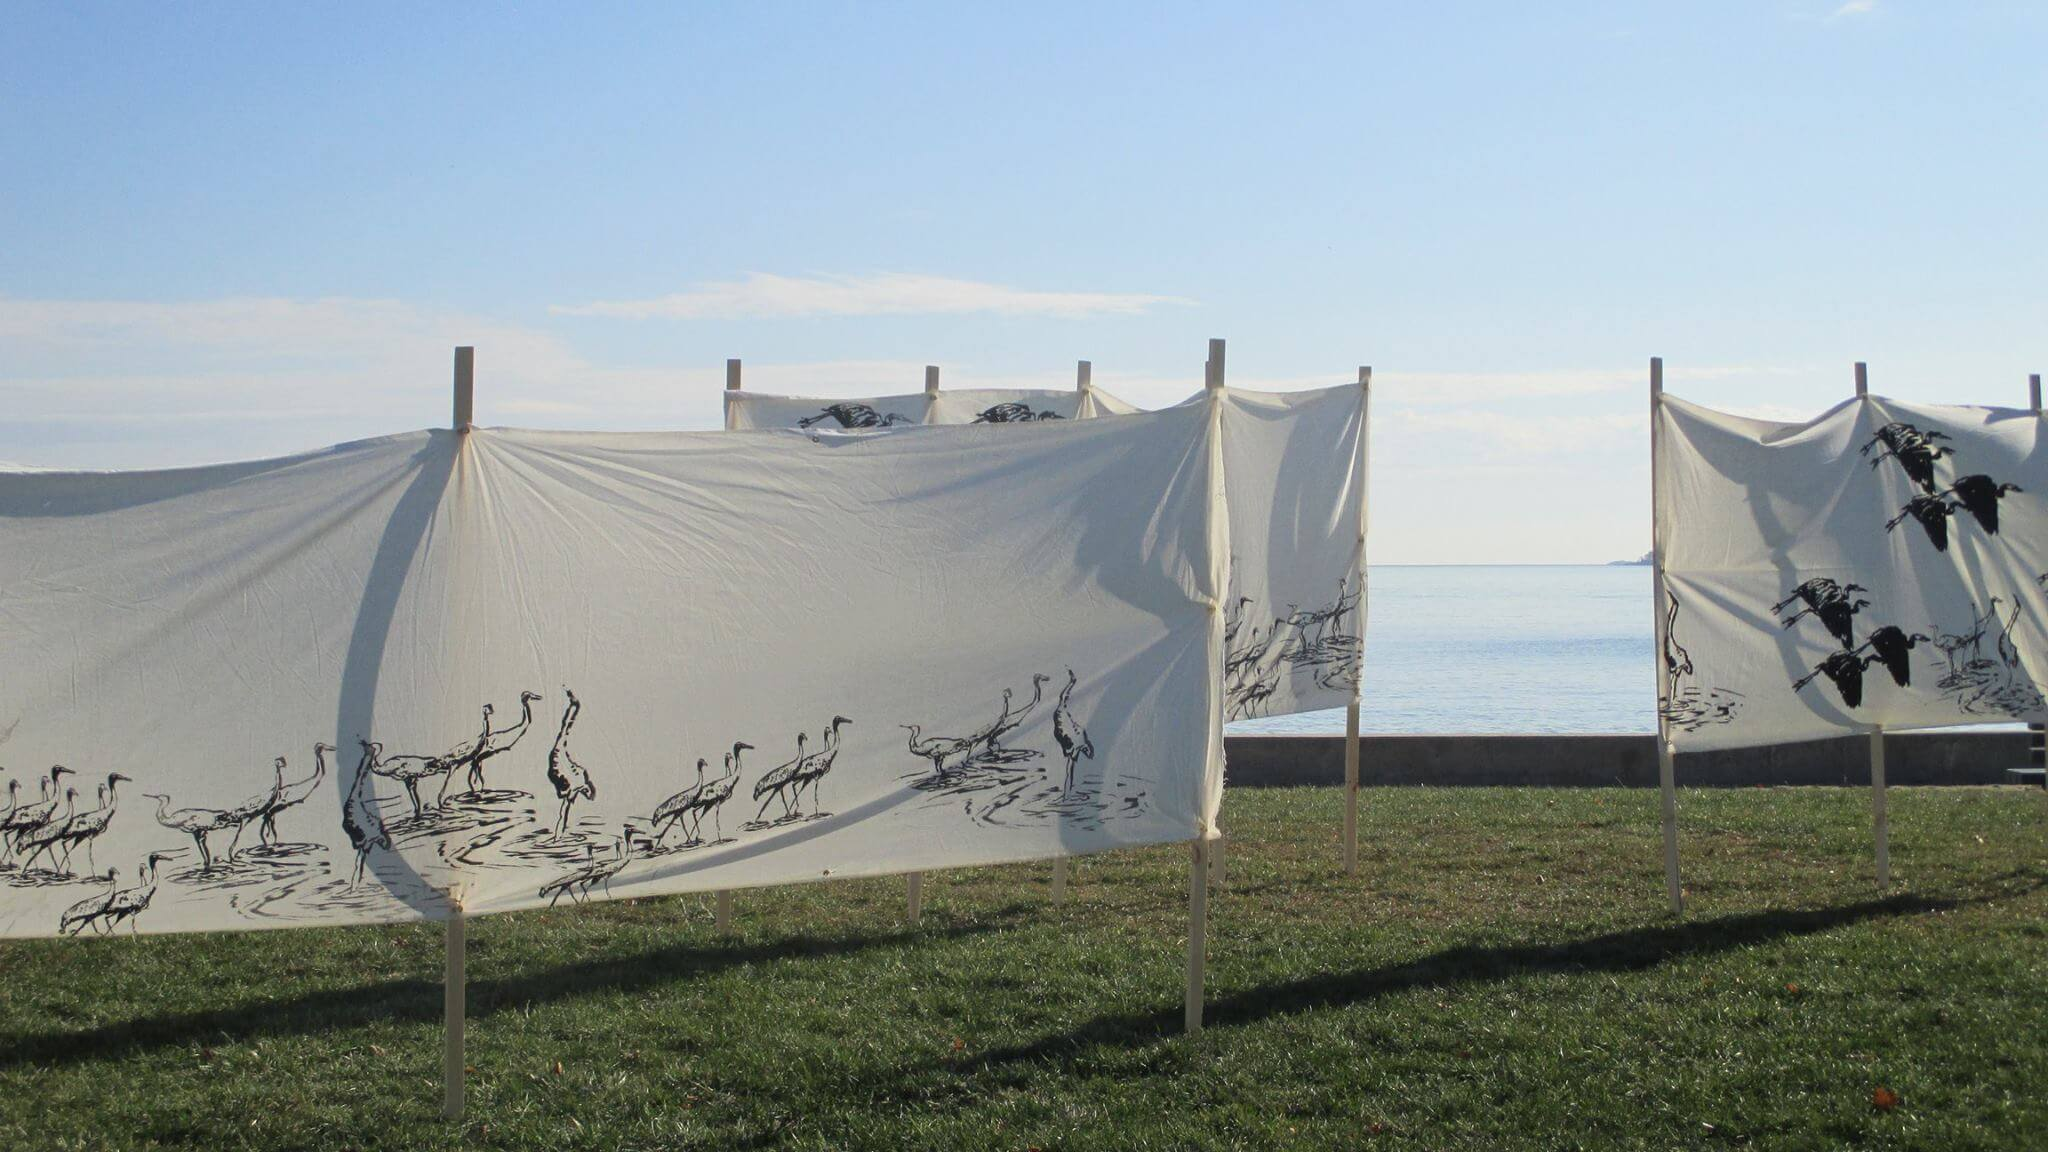 Len Thomas Vickory Prints by the beach